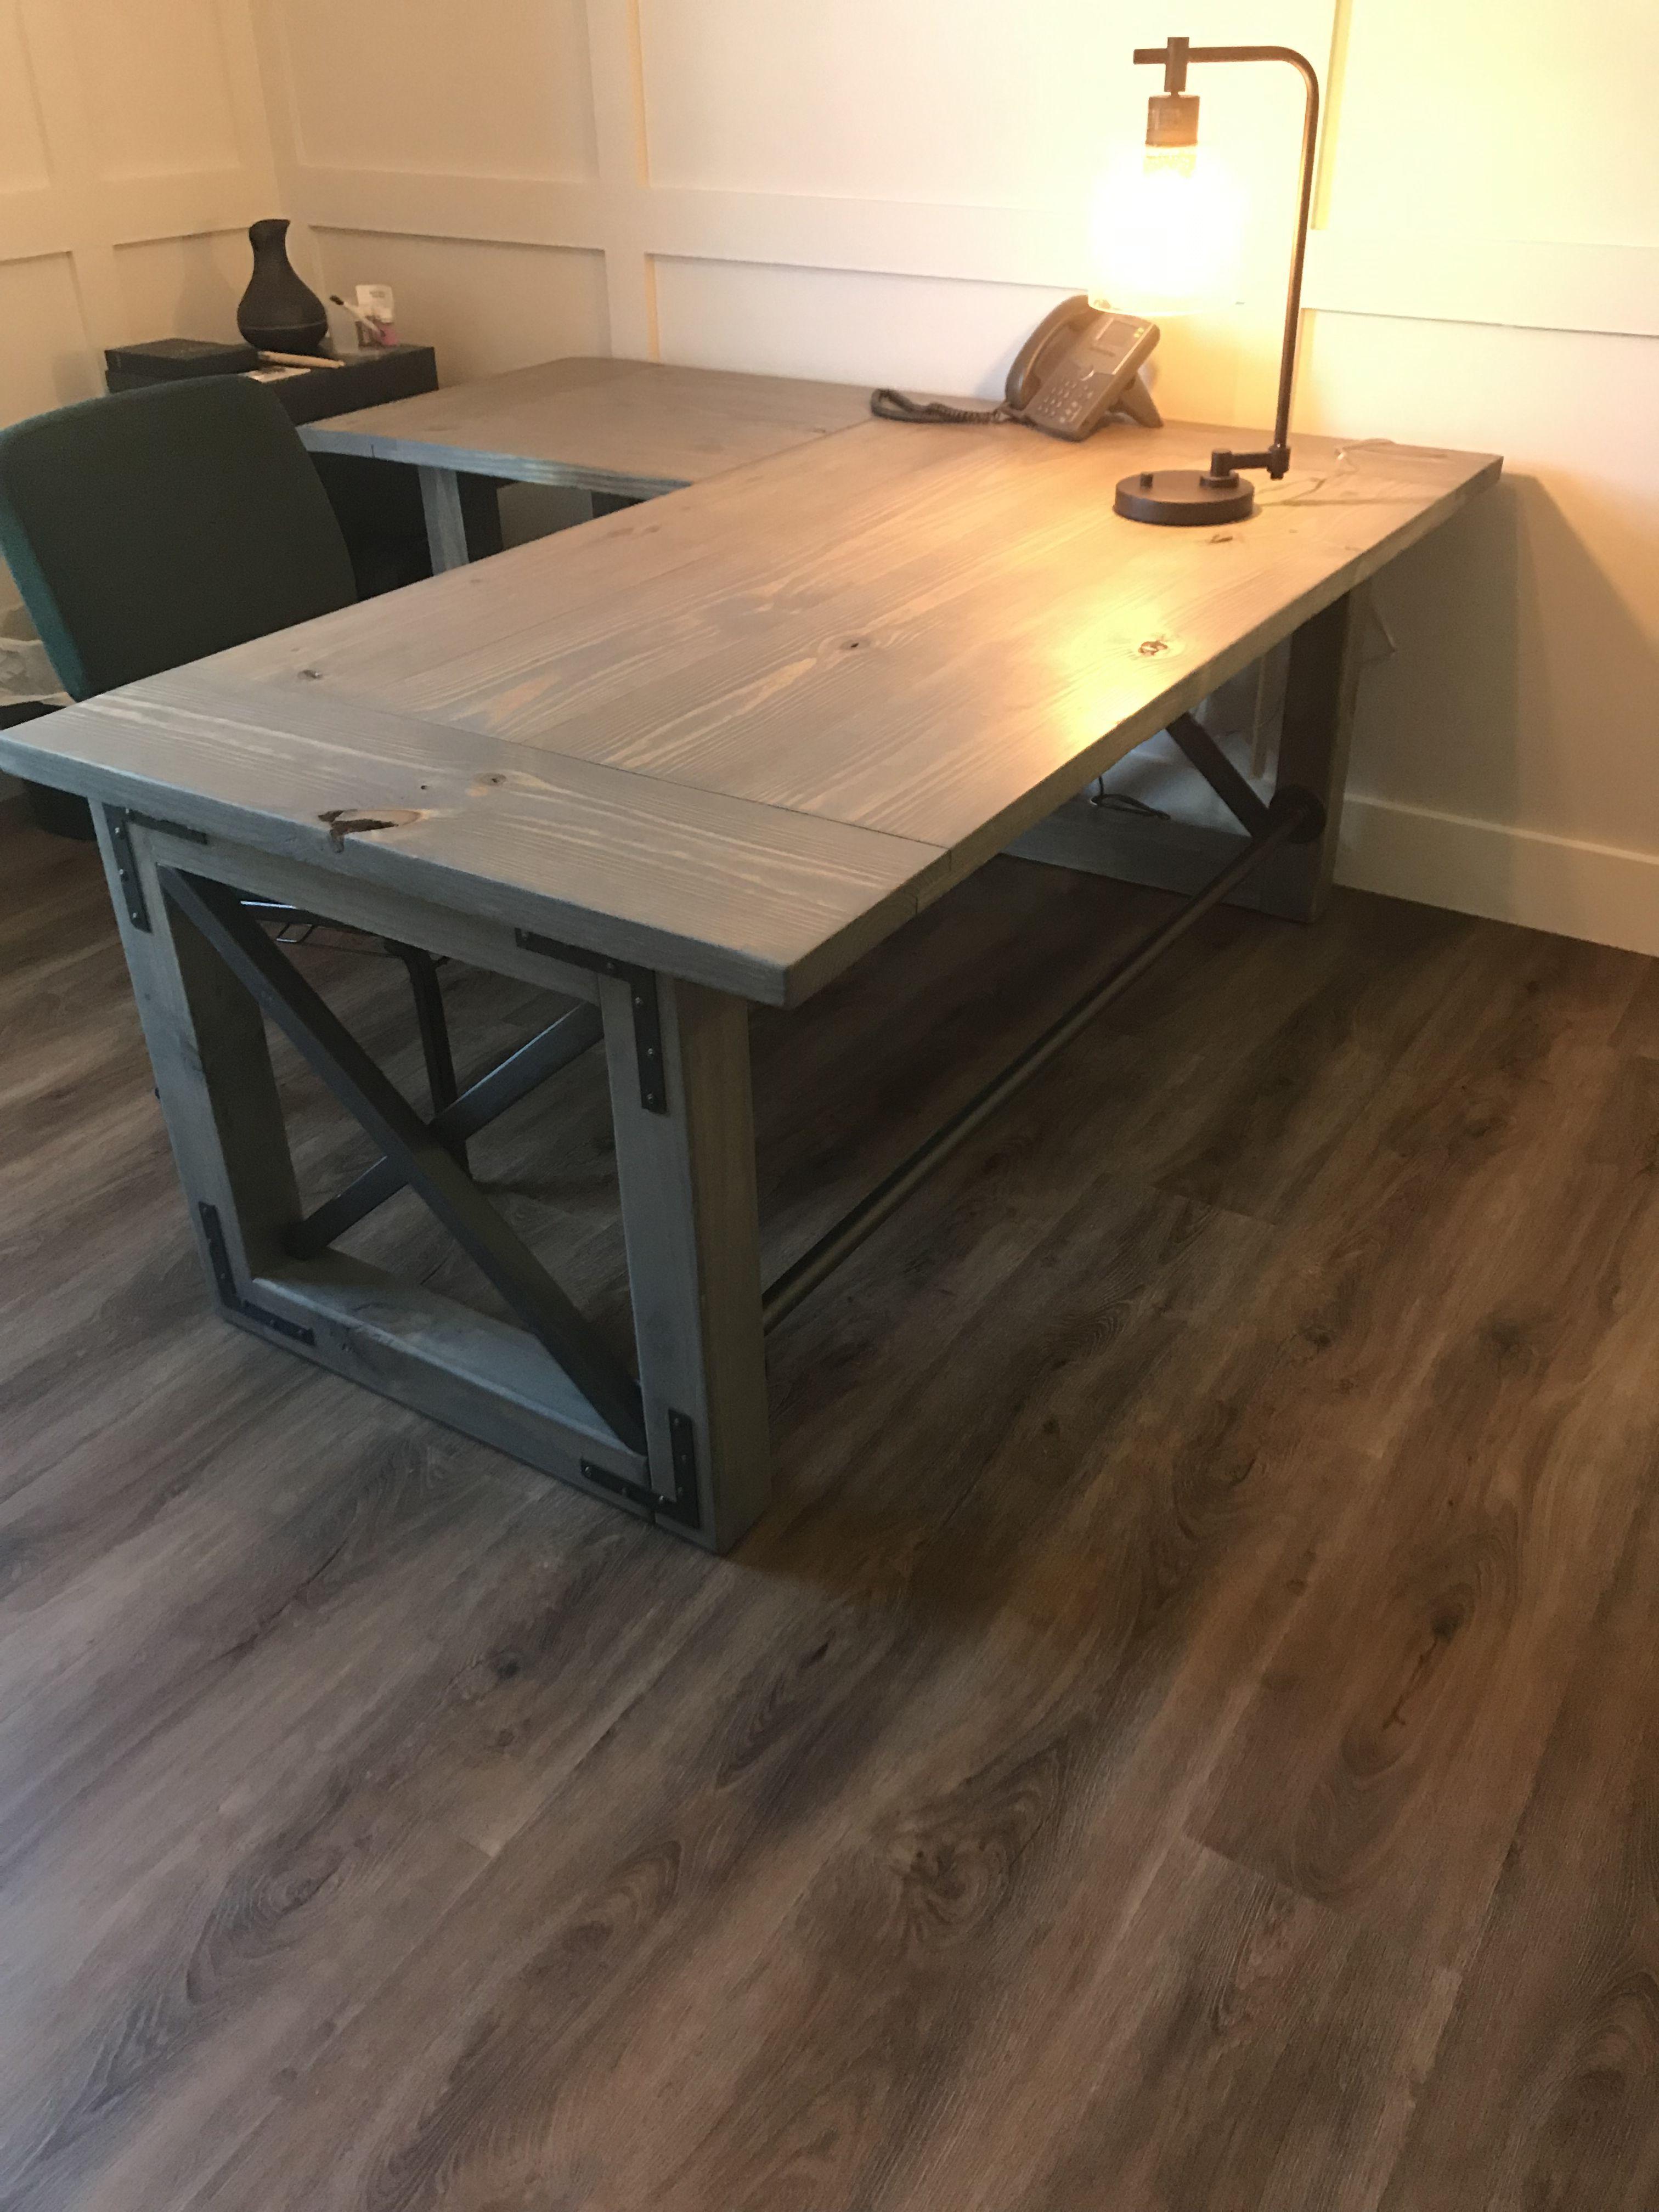 7 Beautiful Home Desk Ideas Make Comfortable For Cozy Study In 2020 Diy Corner Desk Home Desk Rustic Office Desk